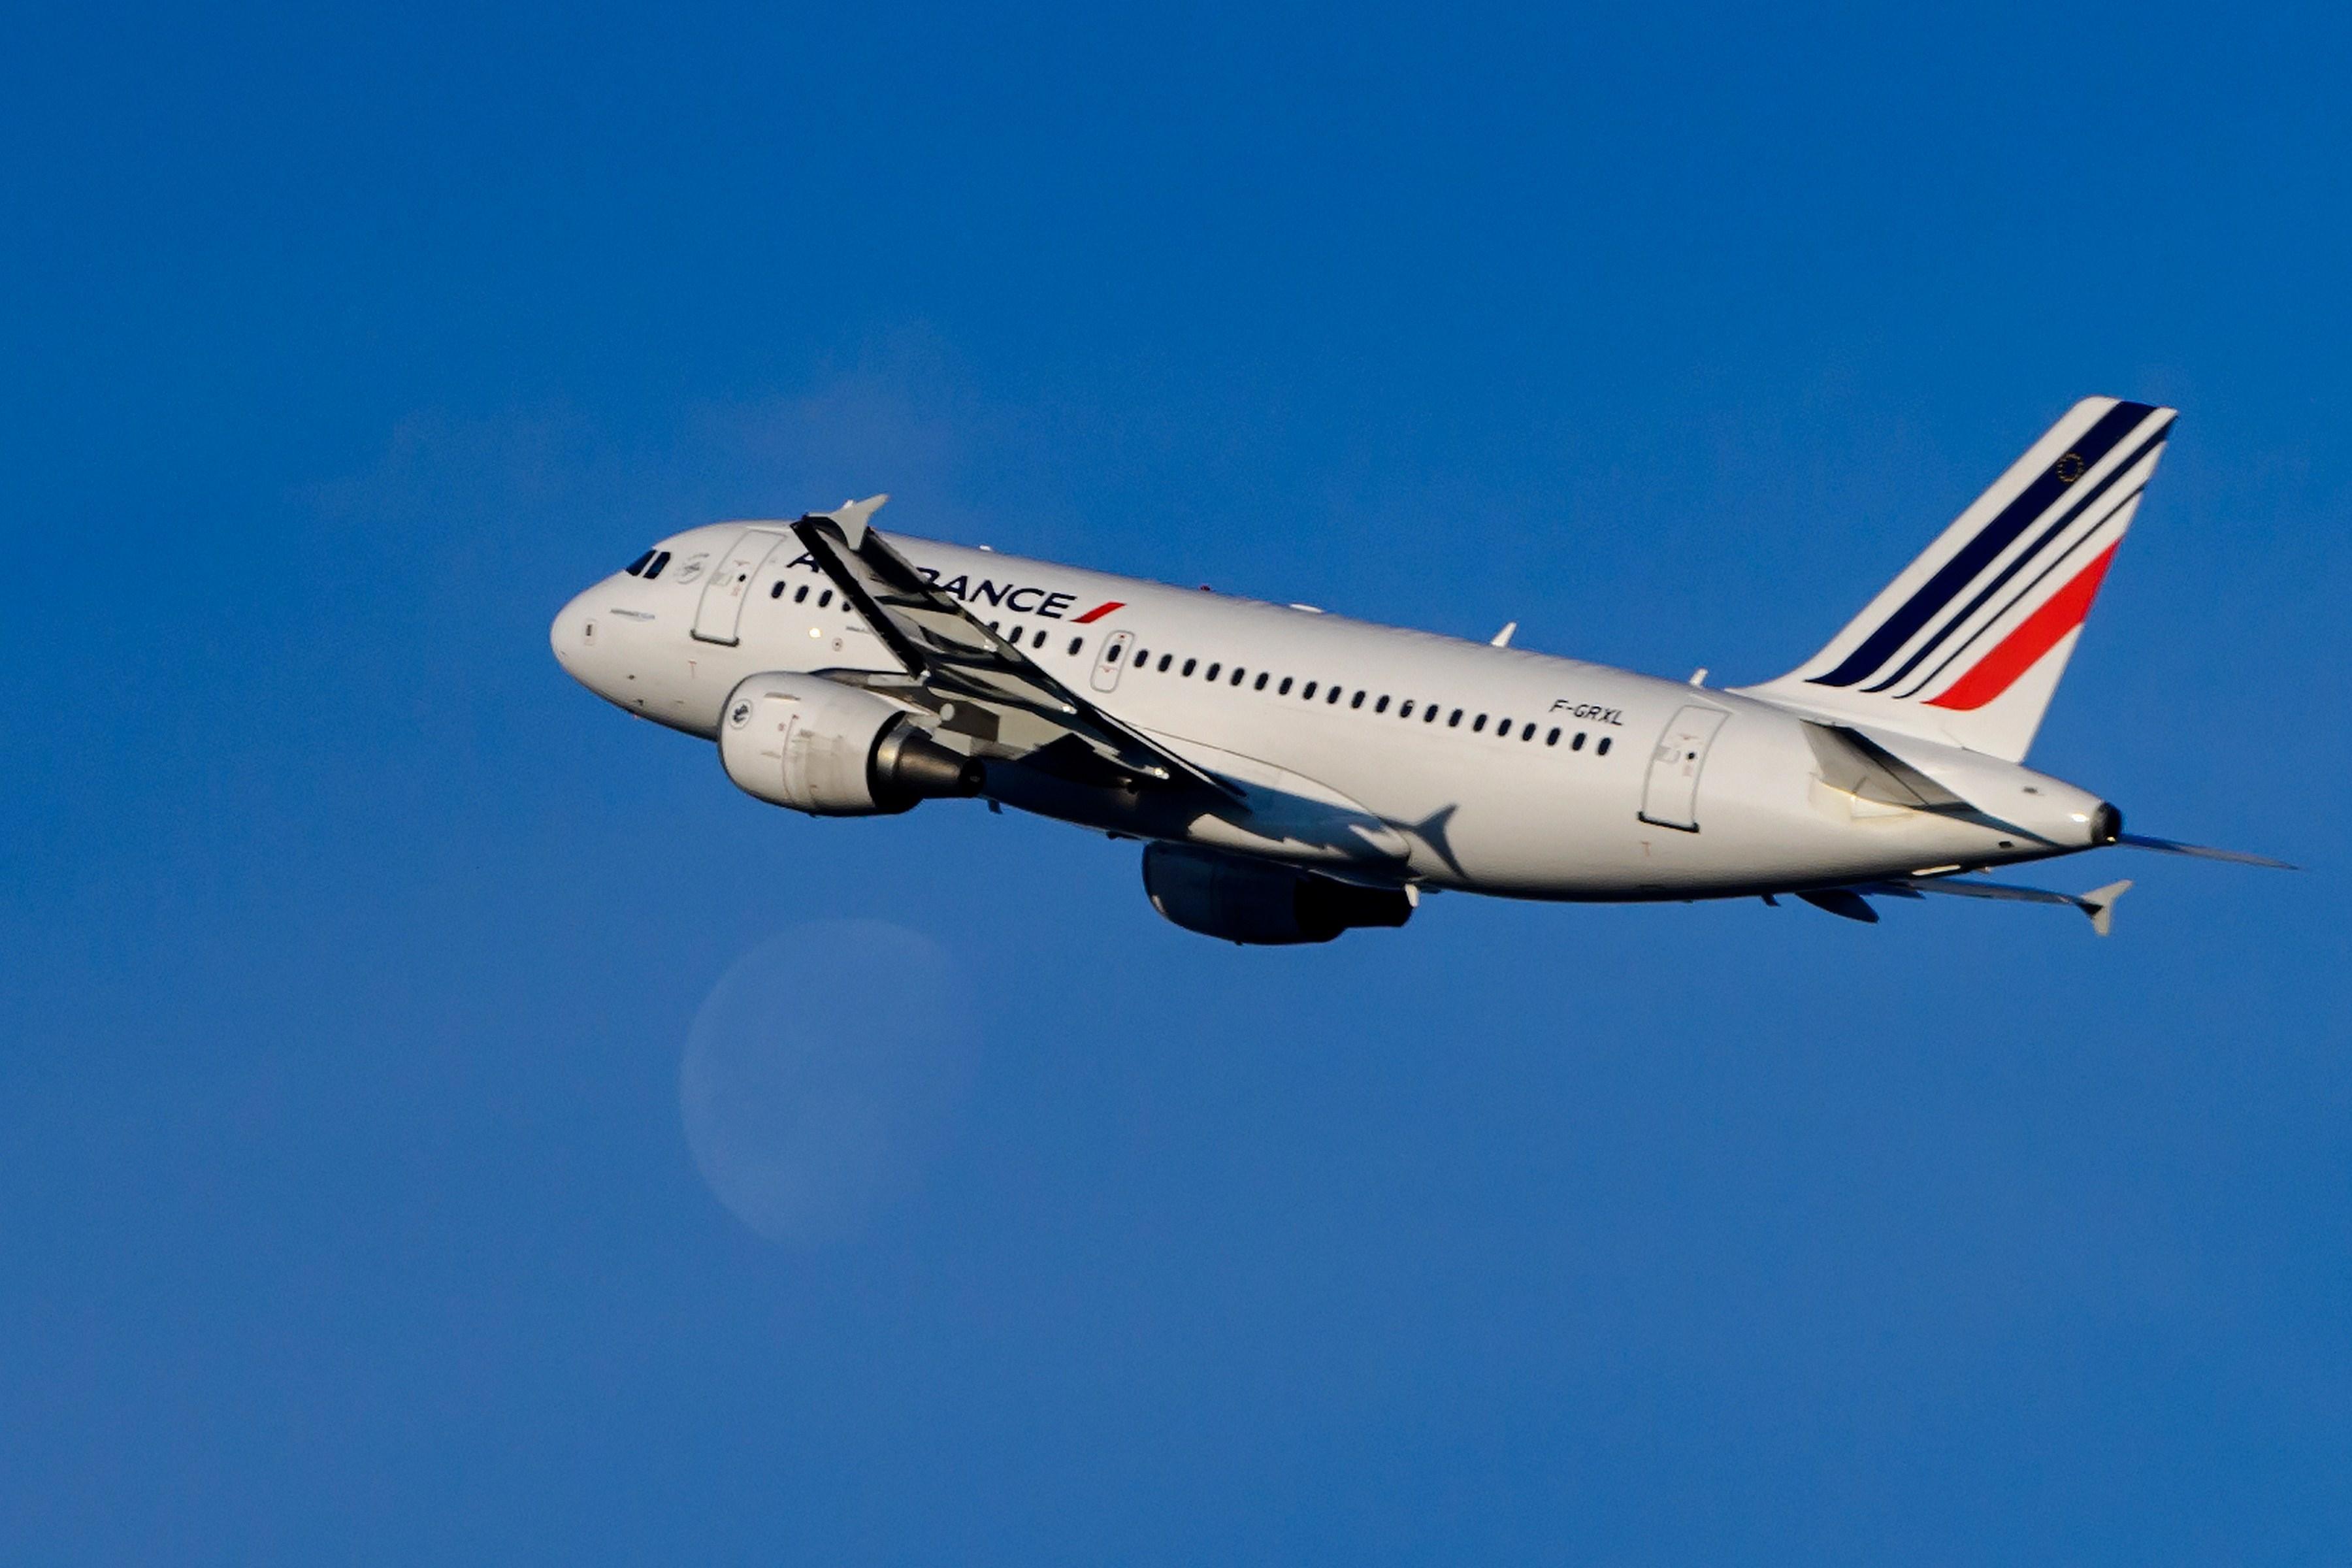 SWITZERLAND-IATA-AIRLINE-BUSINESS-EARNINGS